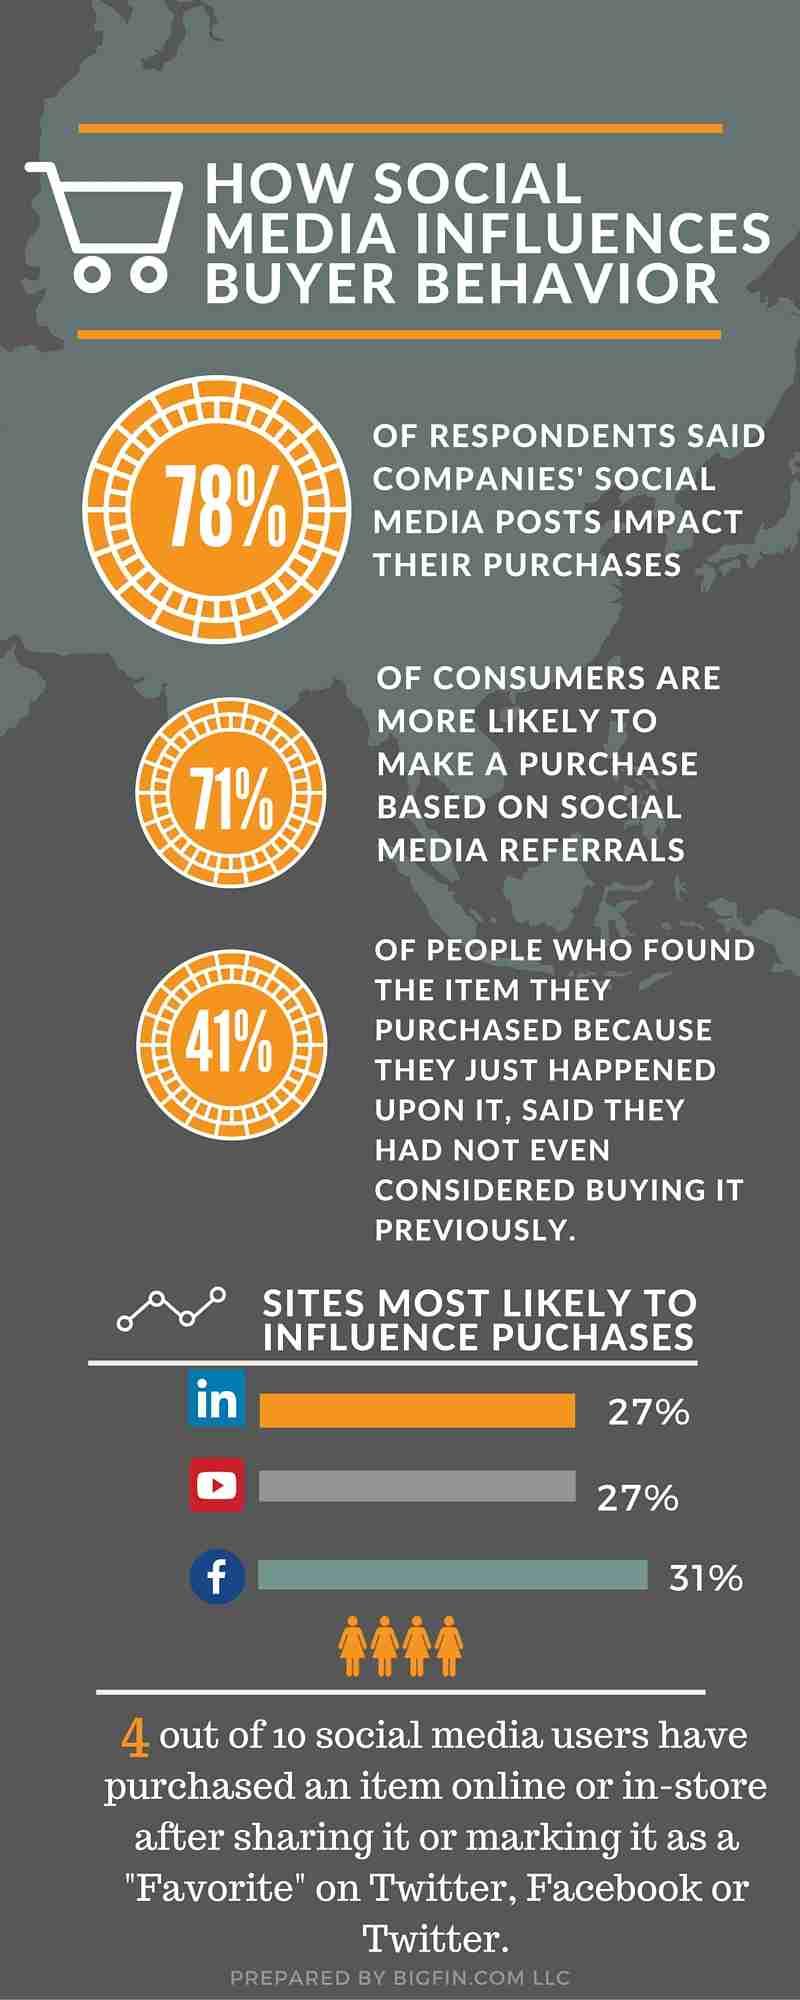 Purchases Via Social Media